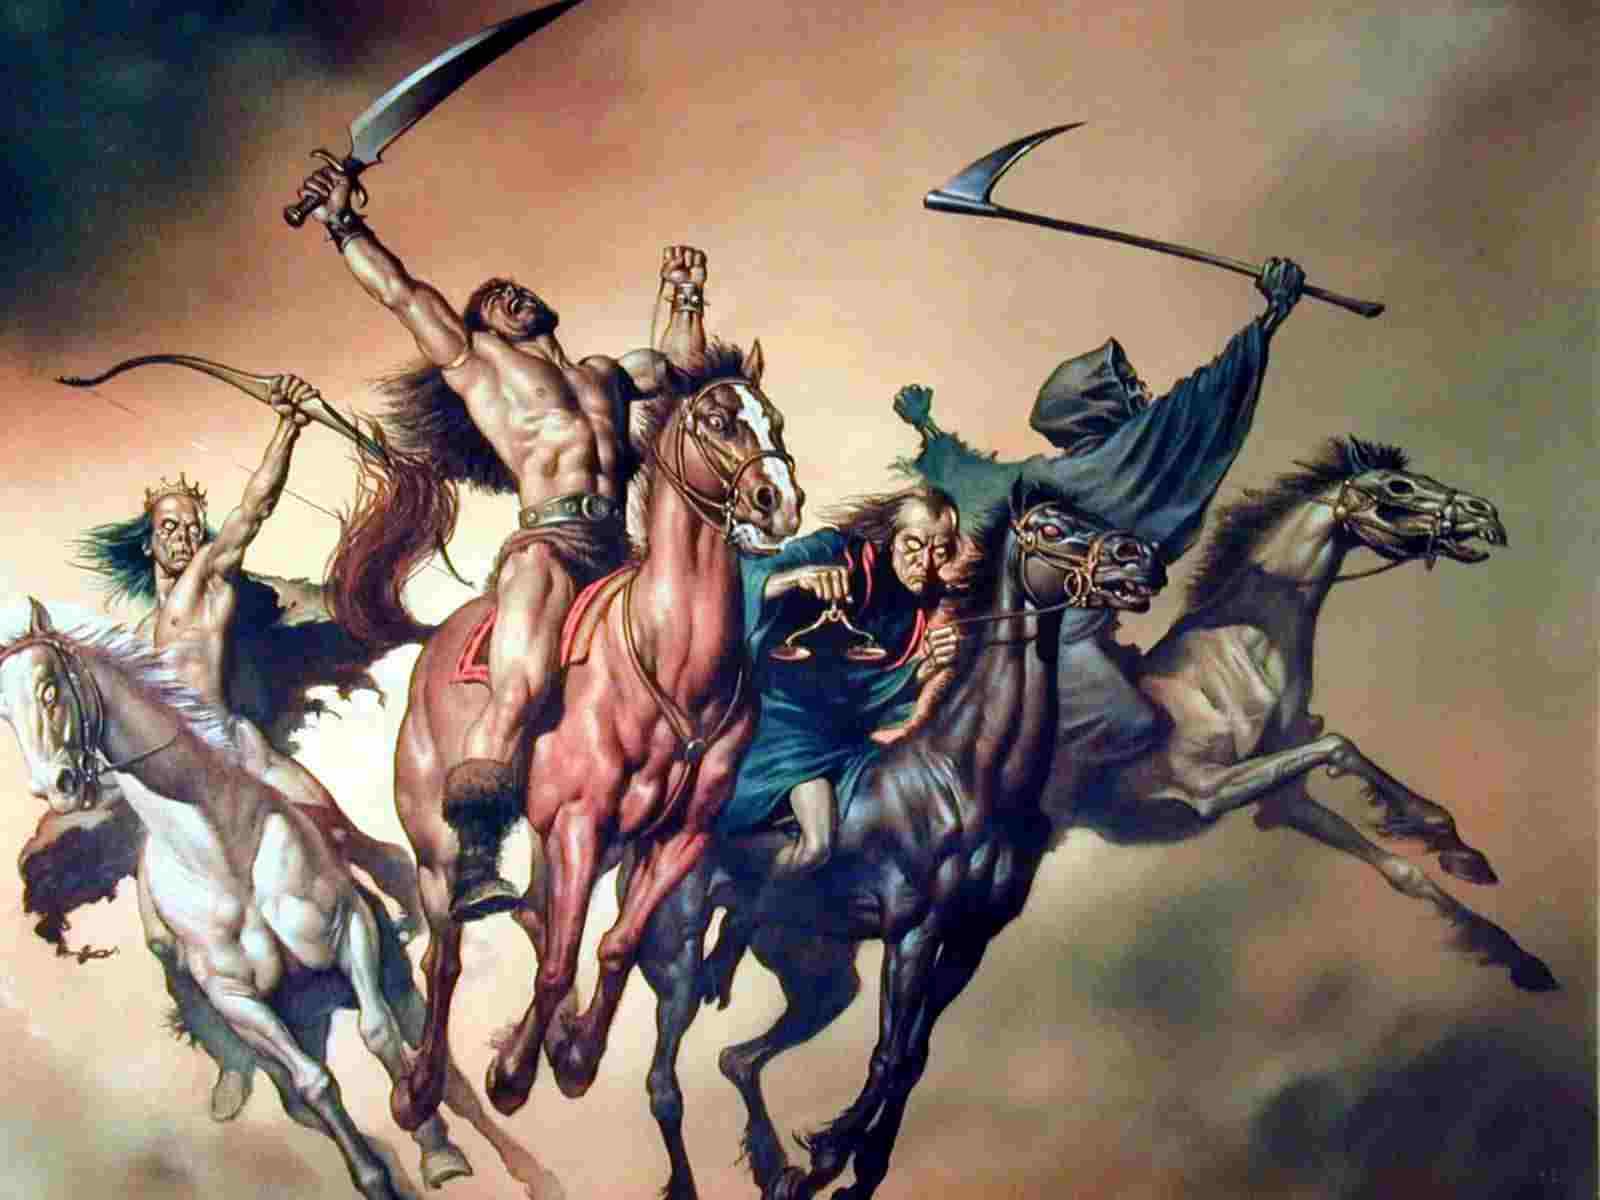 the-four-horsemen-of-the-apocalypse.jpg